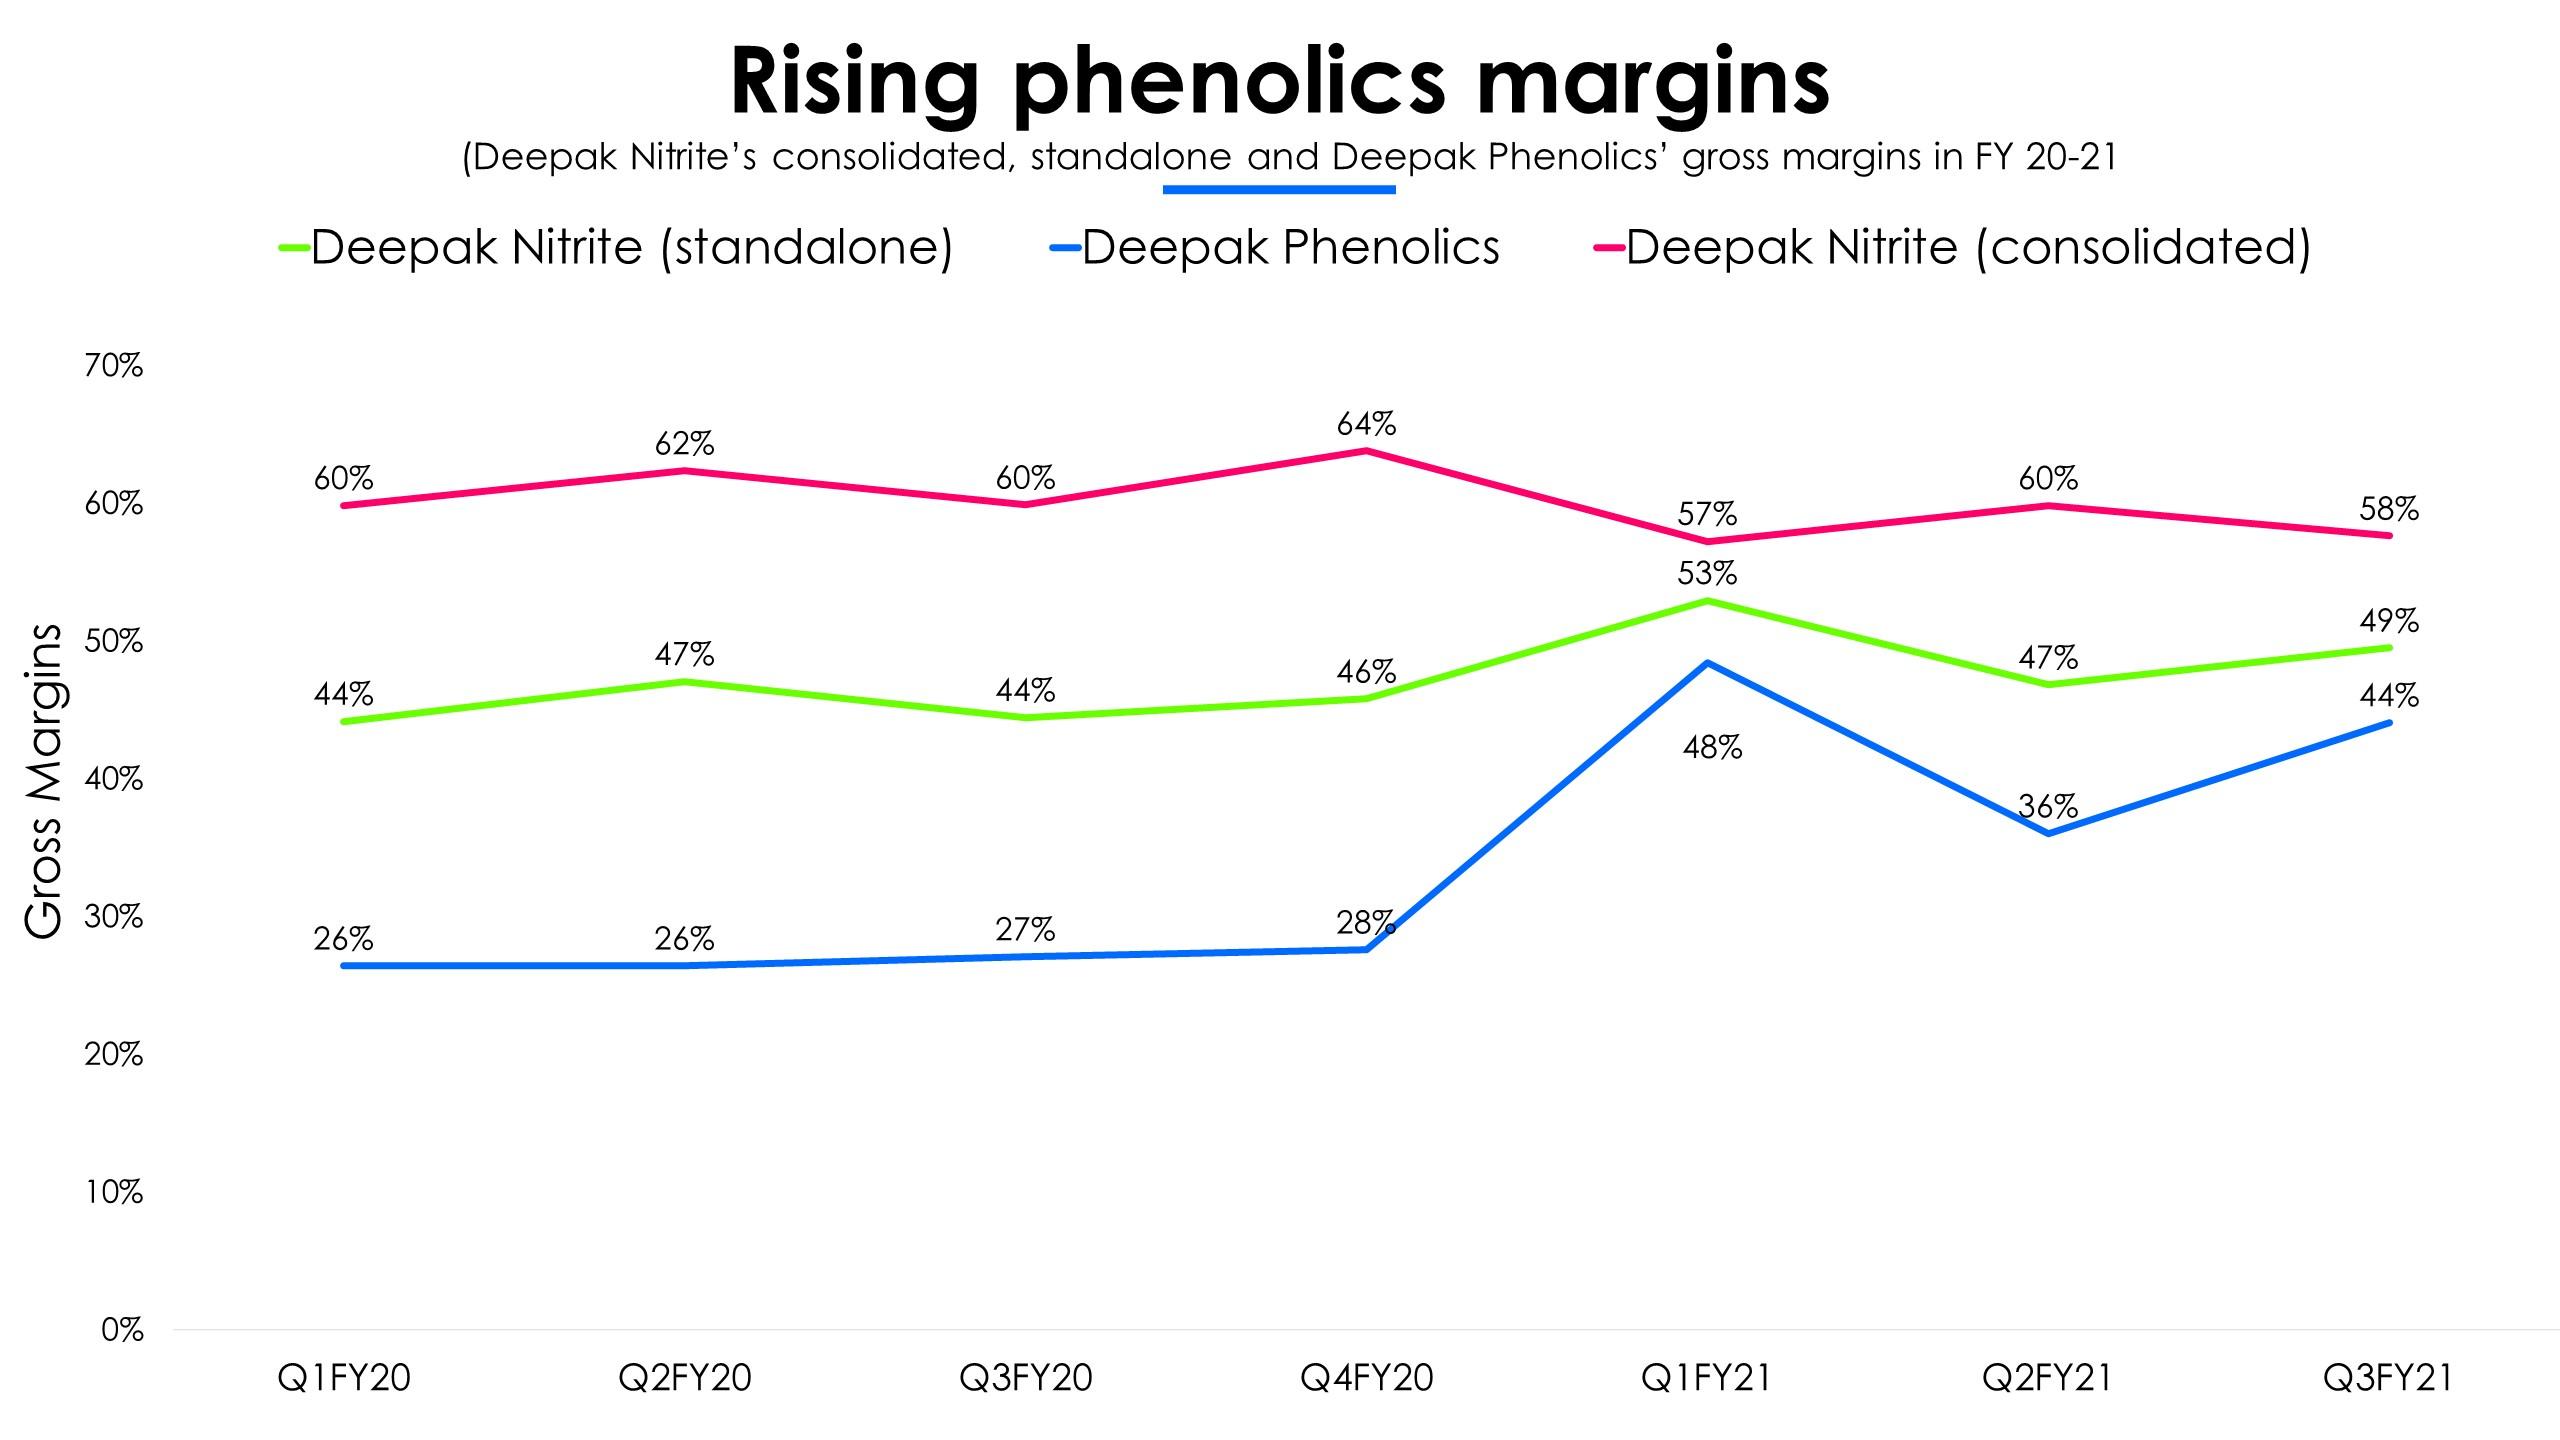 Deepak Phenolics Margins